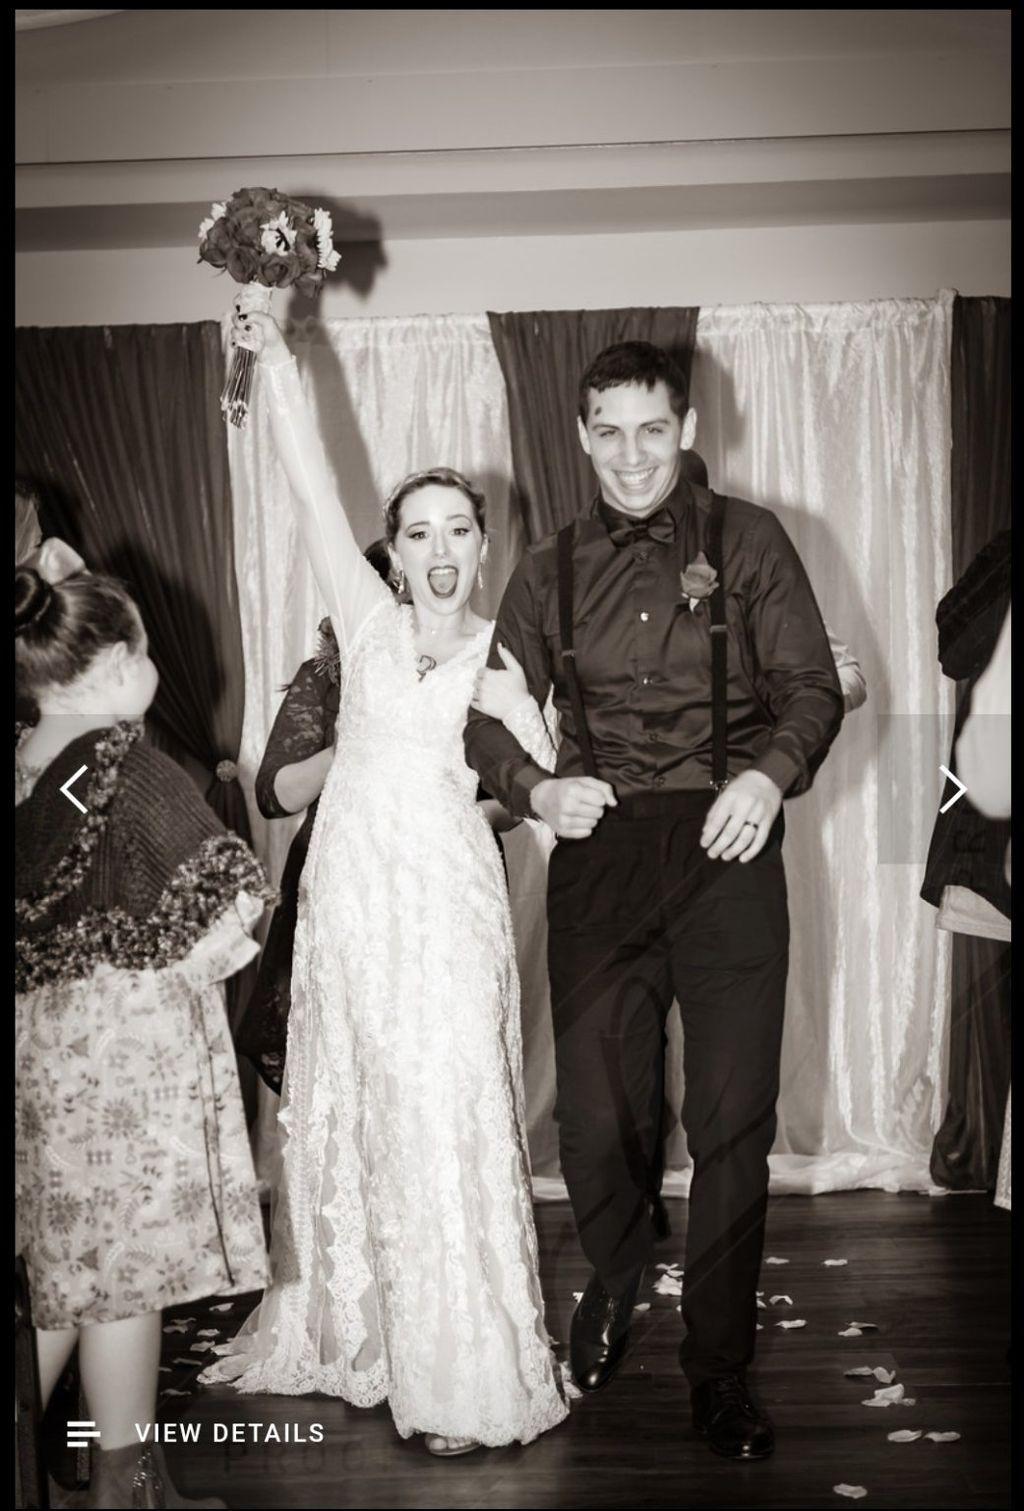 Wedding and Event Photography - Albuquerque 2019